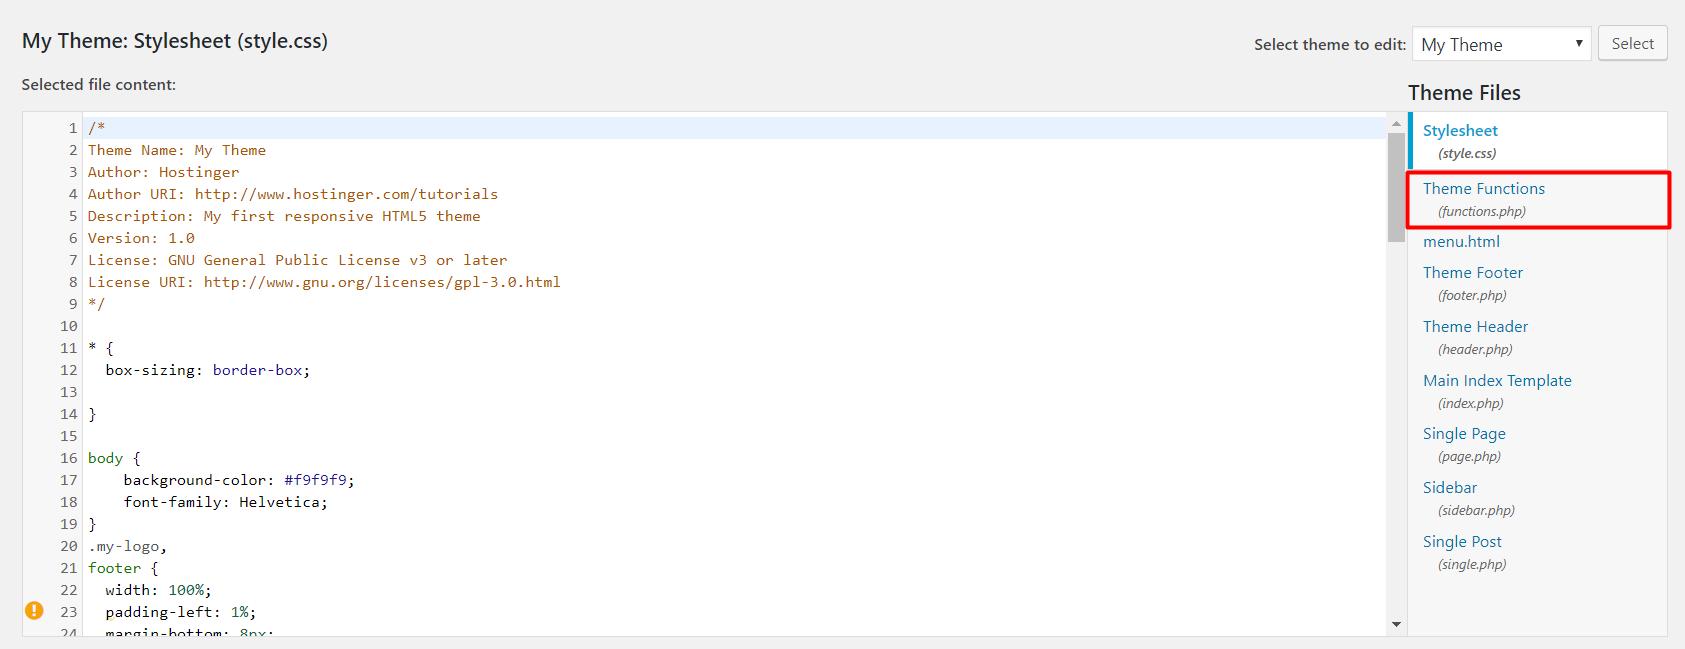 Theme functions in WordPress's theme editor